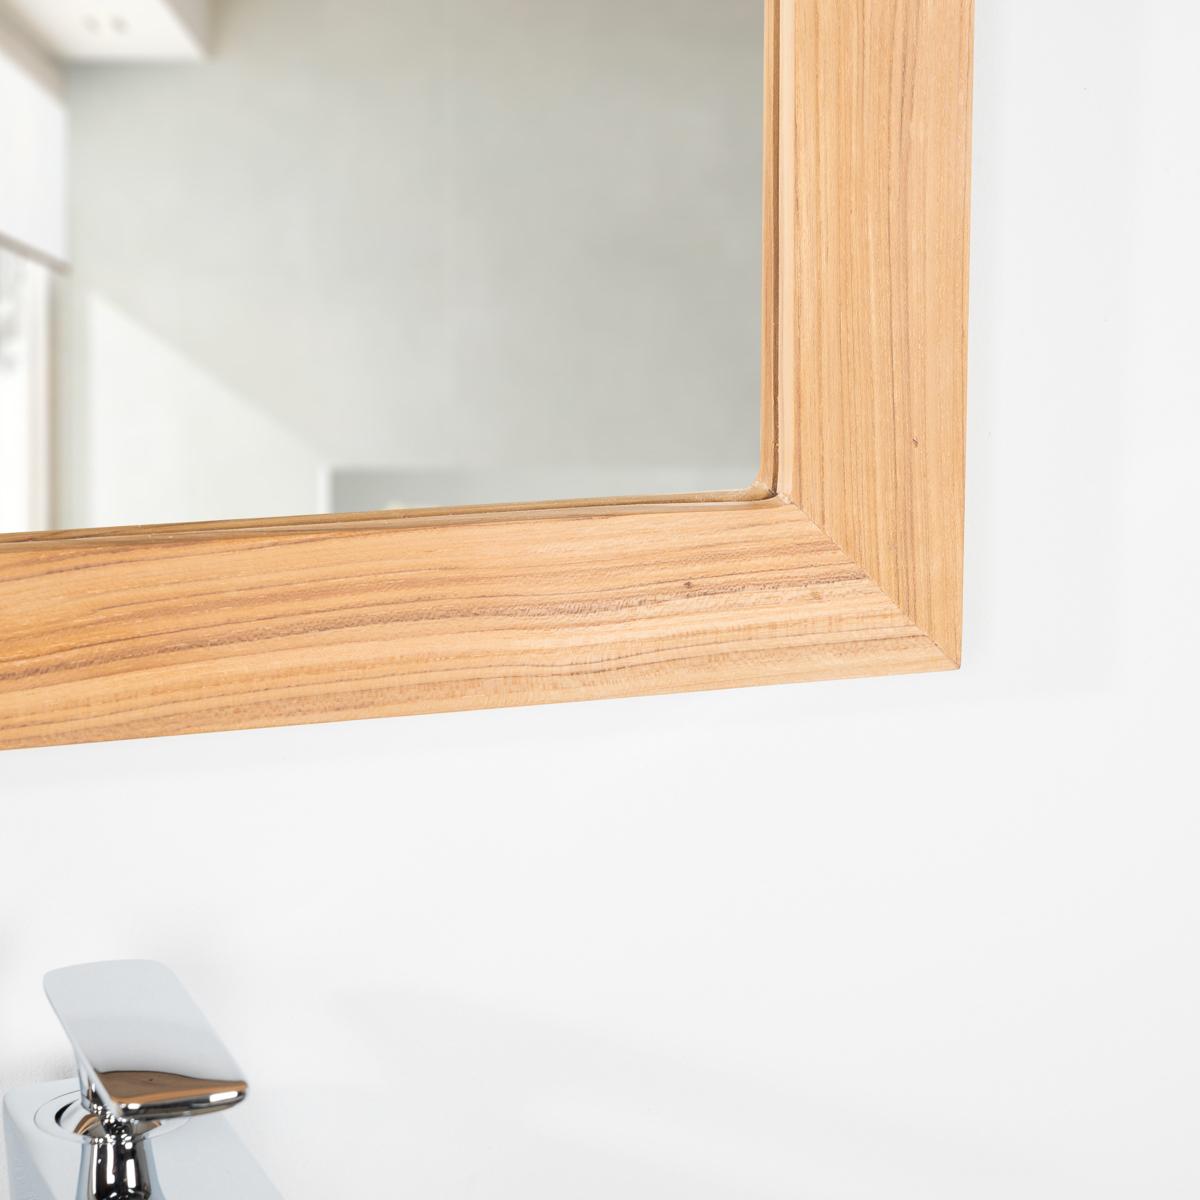 Neuf miroir rectangle en teck massif 70x50 ebay for Miroir bois 50 x 70